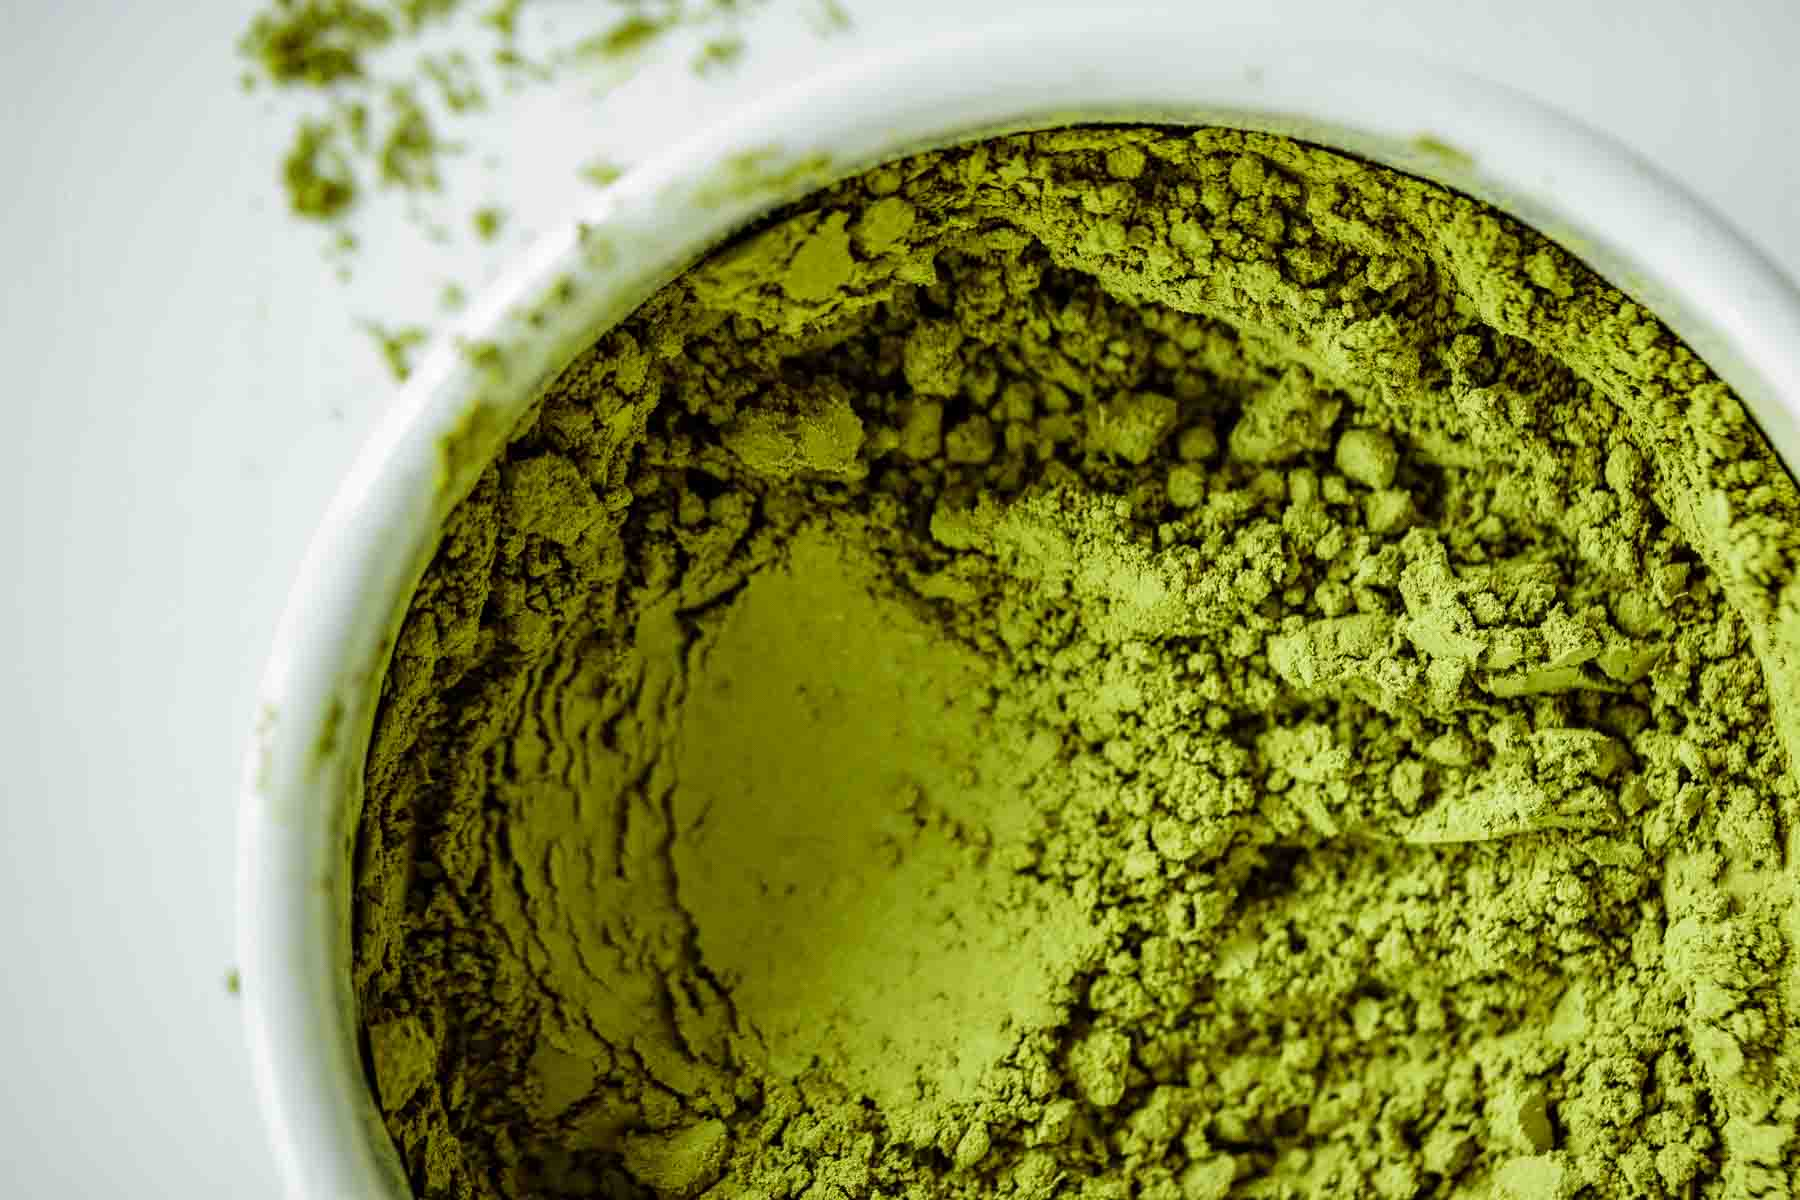 Texture of Matcha powder.